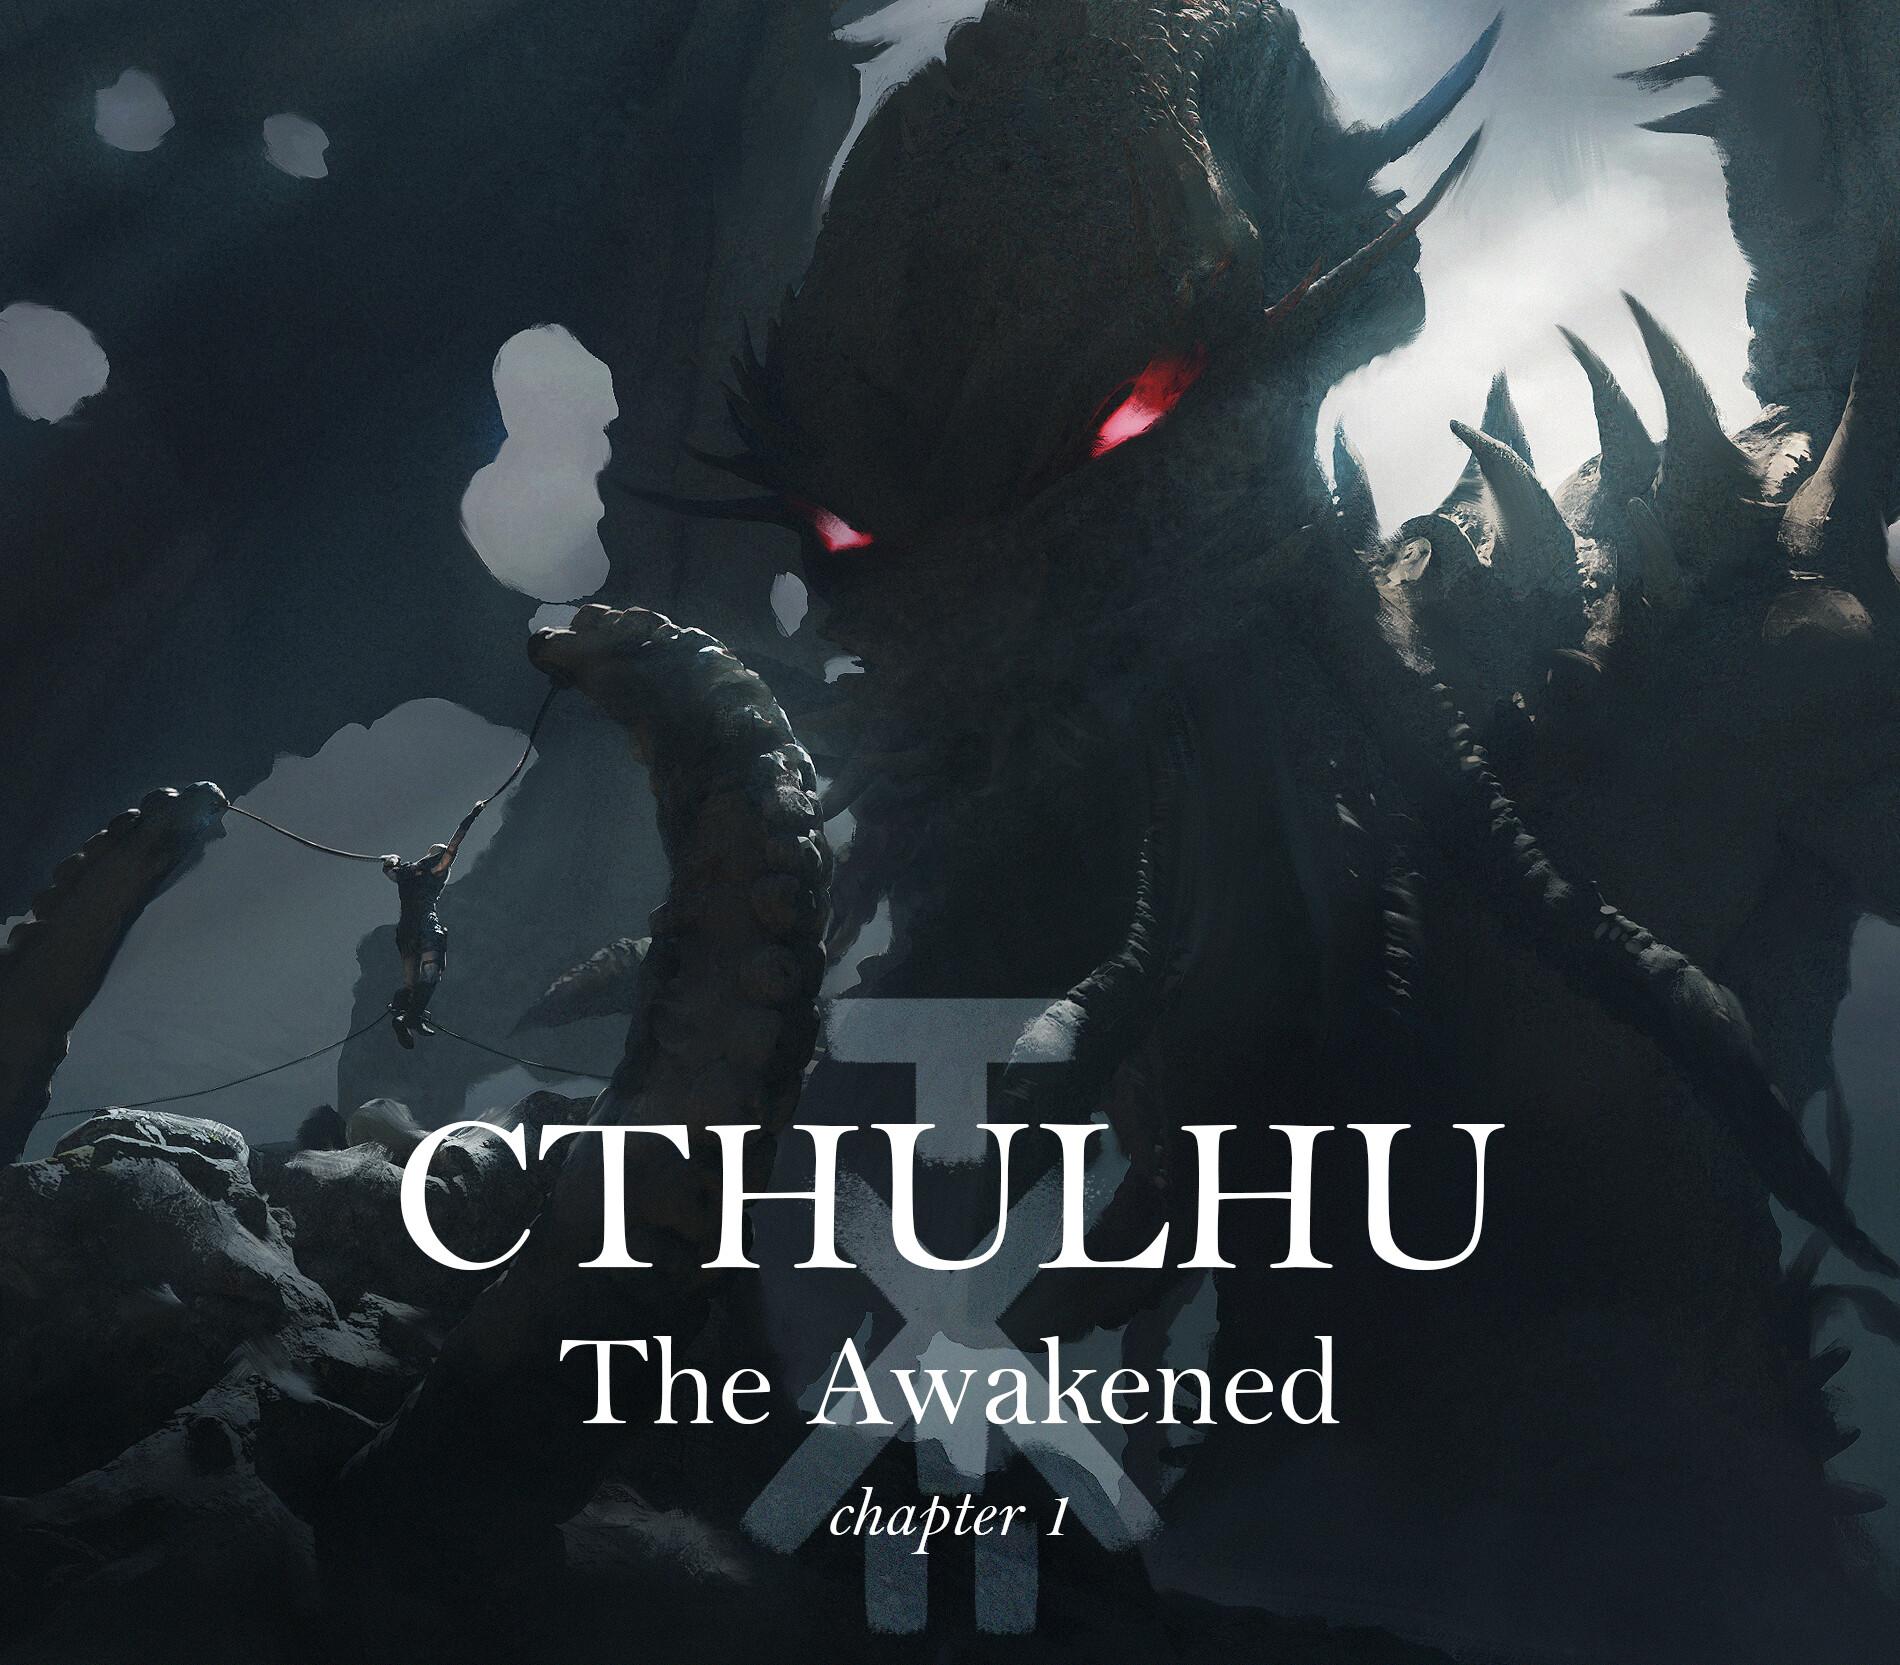 CTHULHU: THE AWAKENED